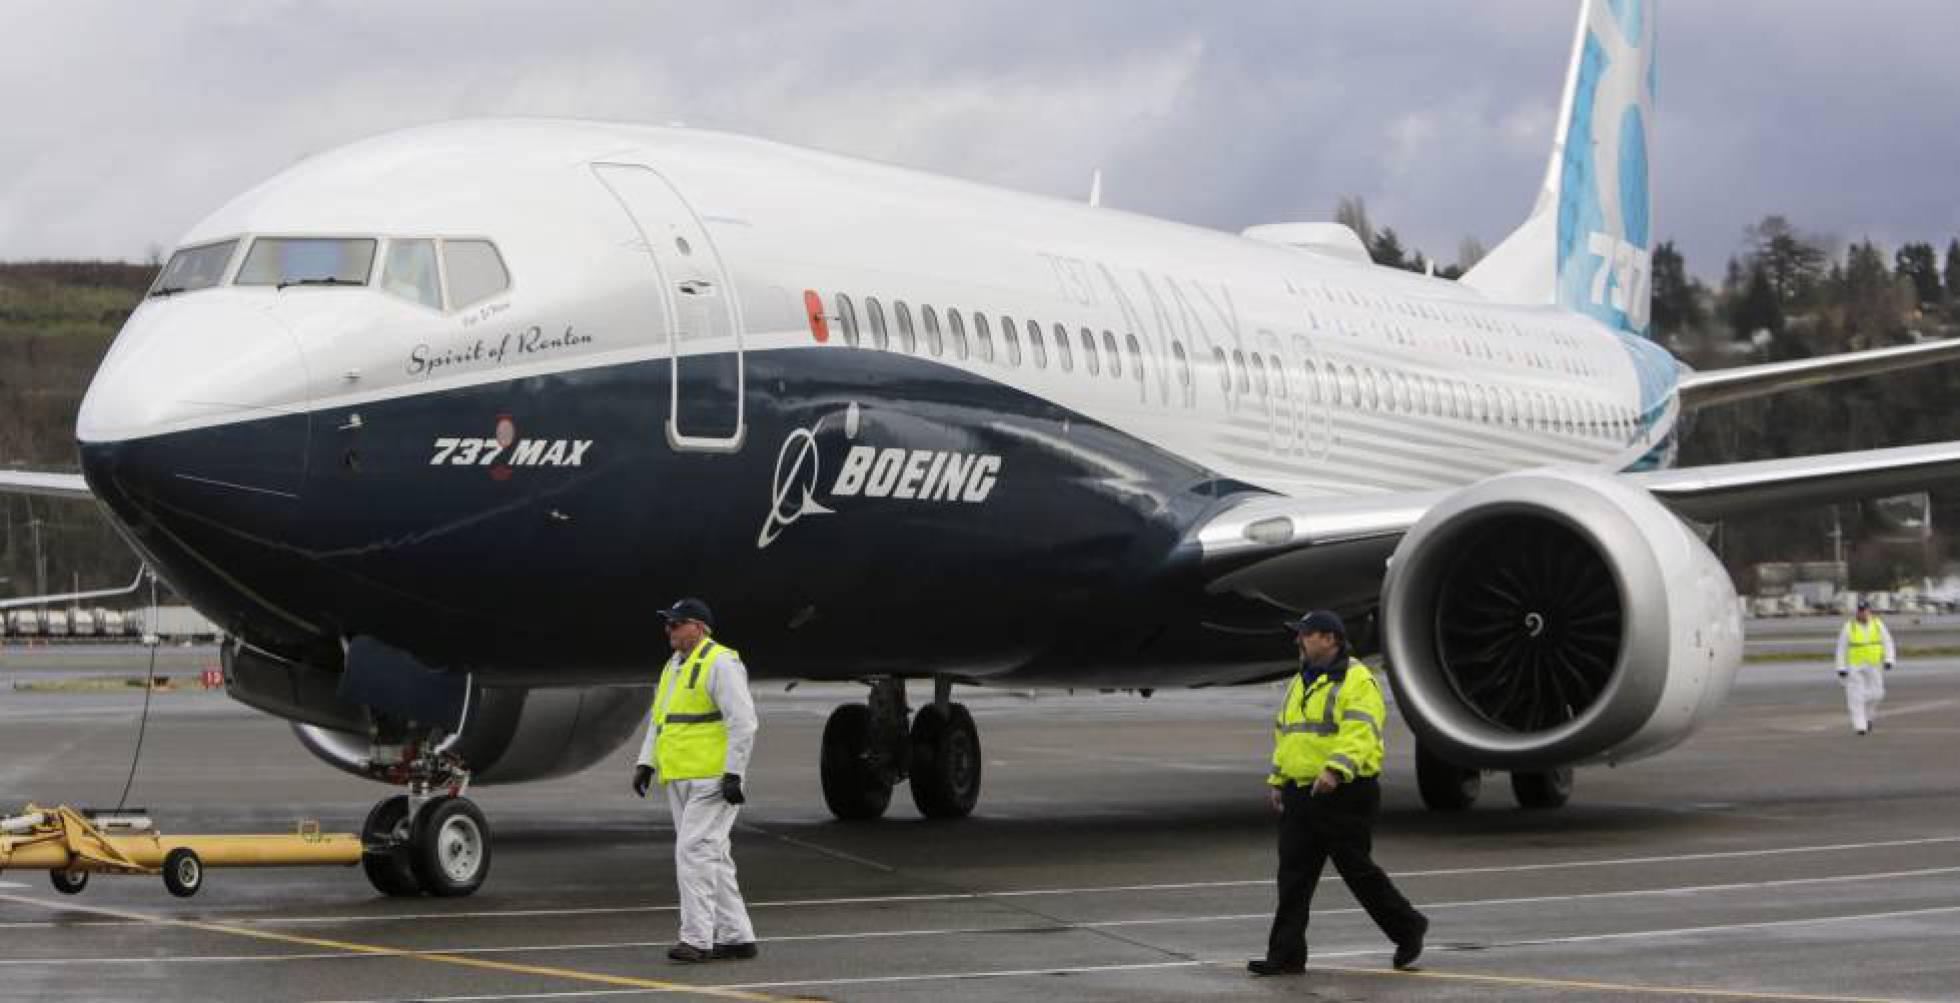 Boeing 737 MAX 1494445459_826702_1494447025_noticia_normal_recorte1